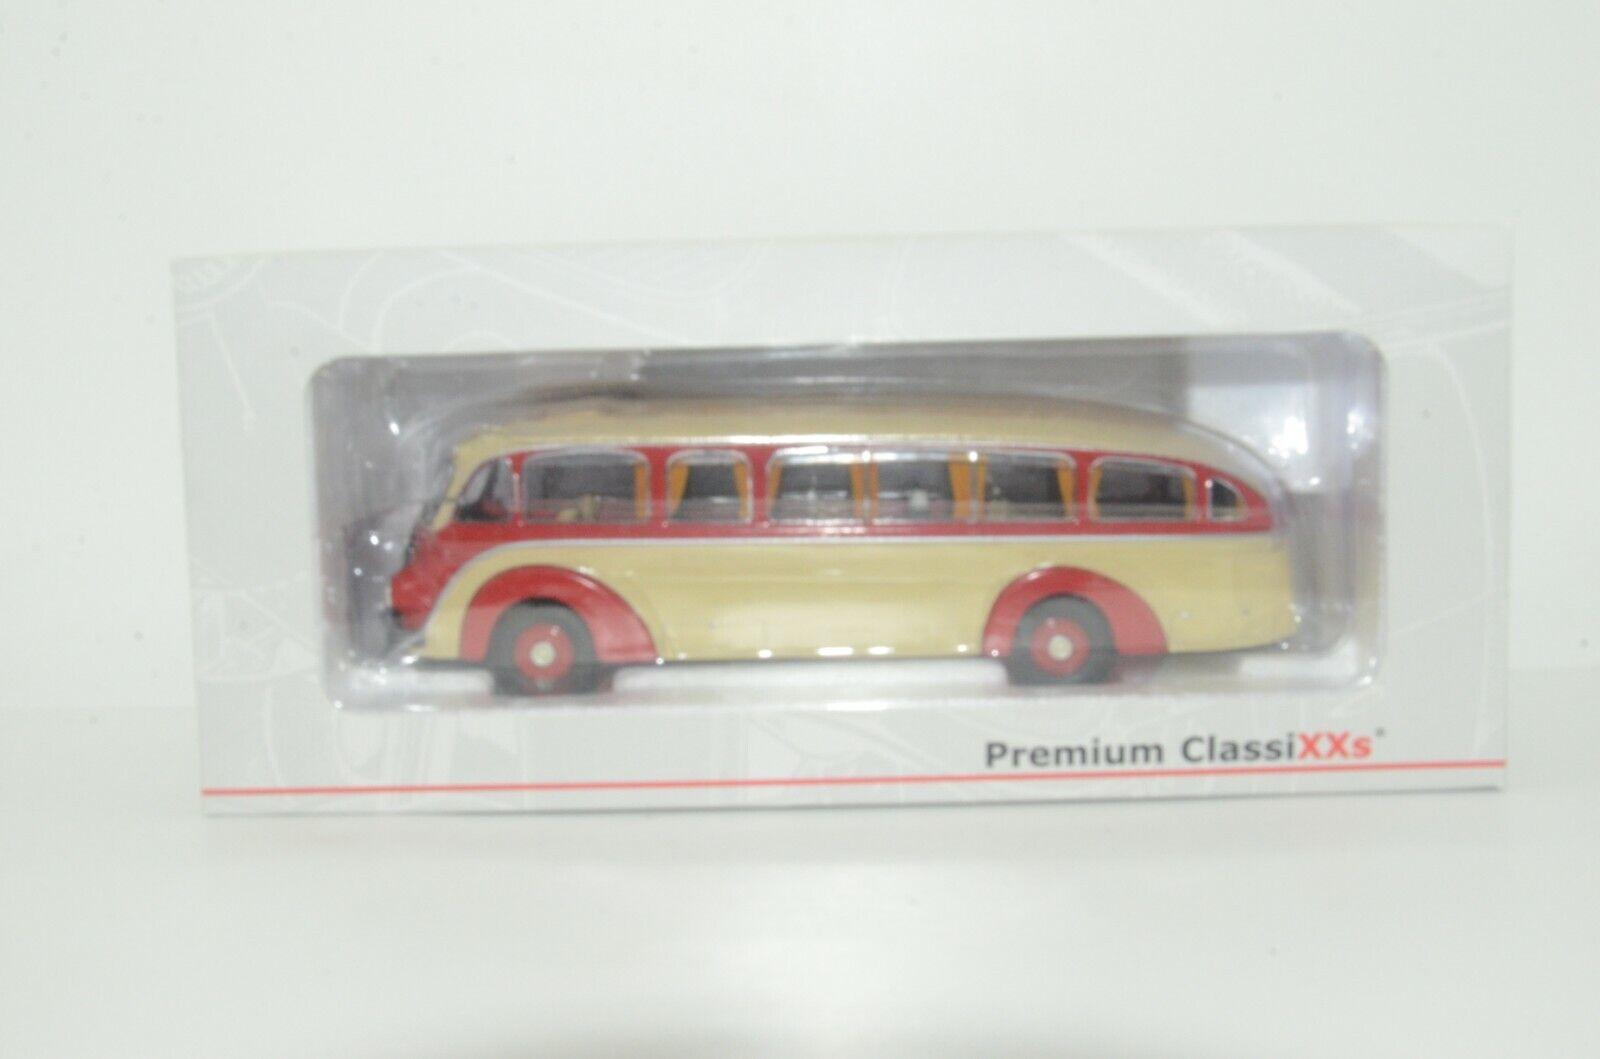 Rare    MERCEDES BENZ LO 3500 Premium ClassiXXs 12325 1 43